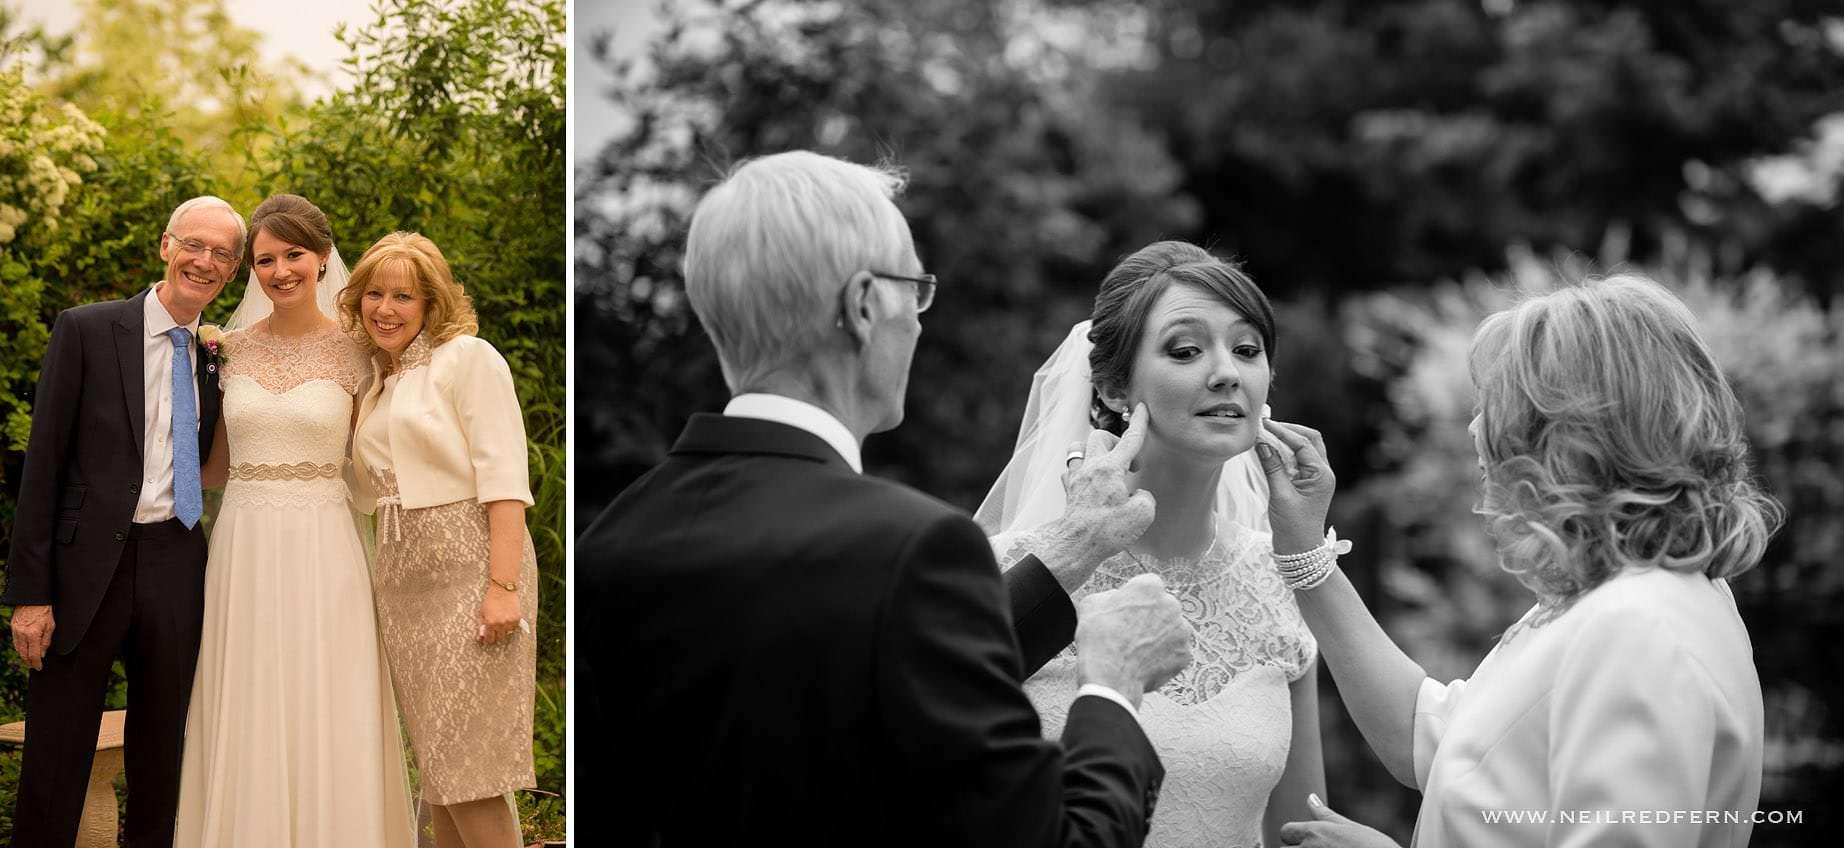 Wedding getting ready photographs 23